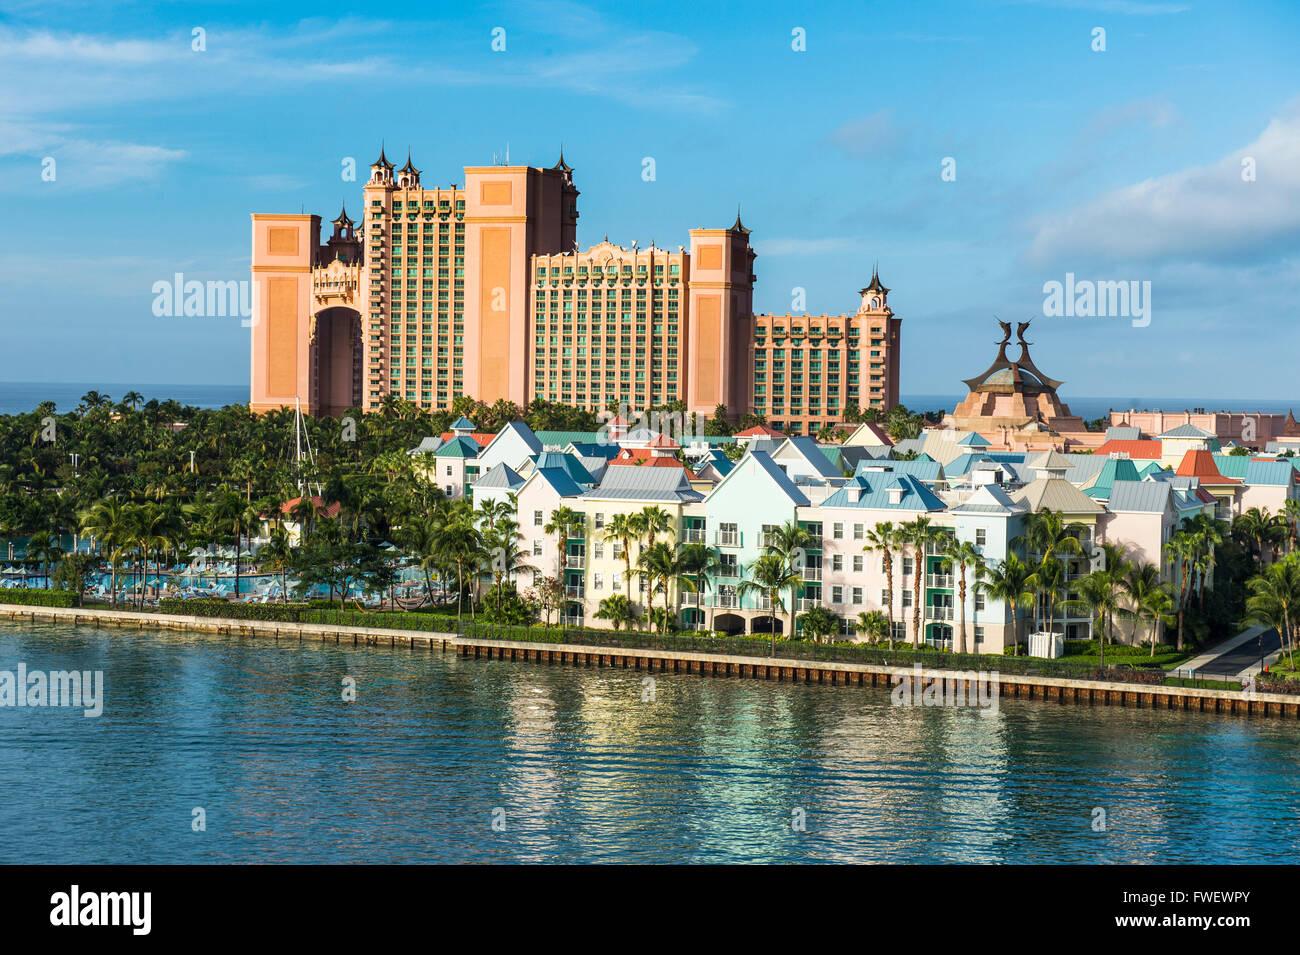 Hotel Atlantis Paradise Island, a Nassau, New Providence, Bahamas, dei Caraibi Immagini Stock